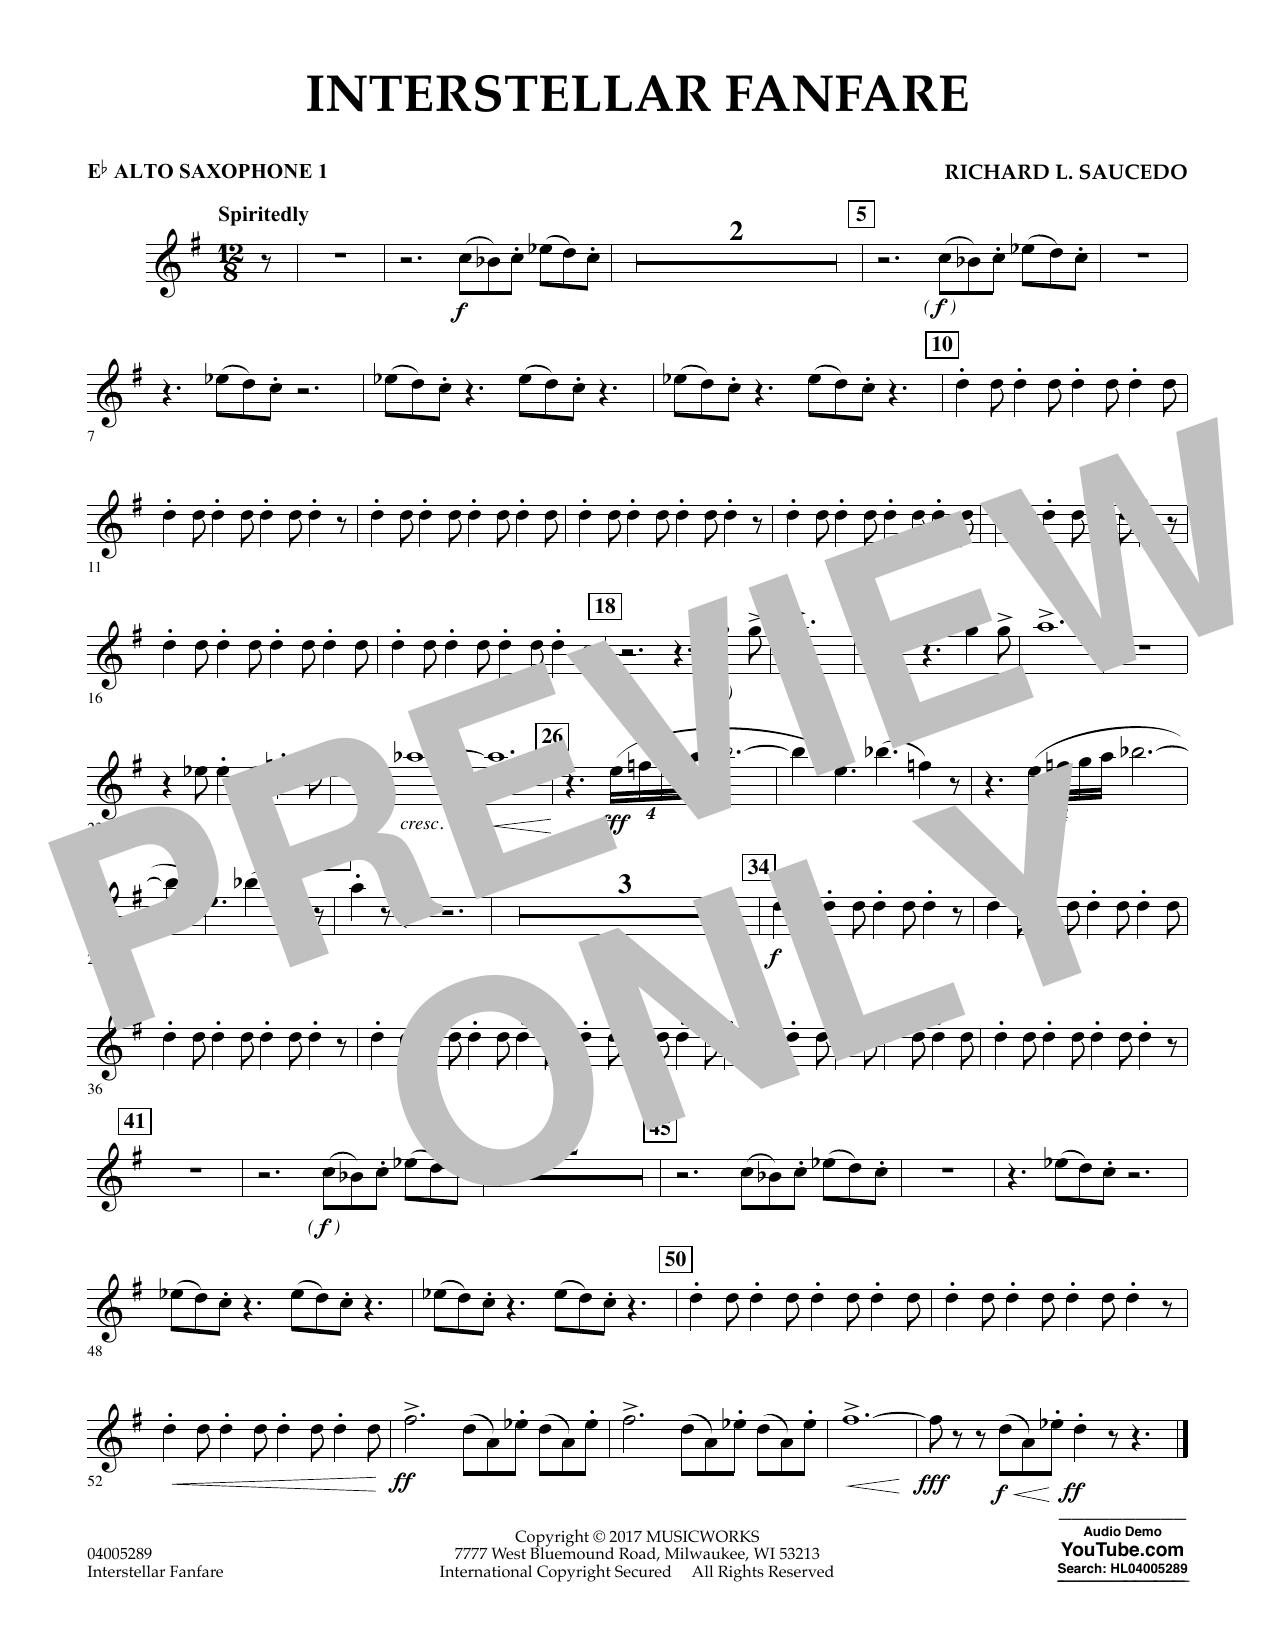 Richard L. Saucedo Interstellar Fanfare - Eb Alto Saxophone 1 sheet music notes printable PDF score